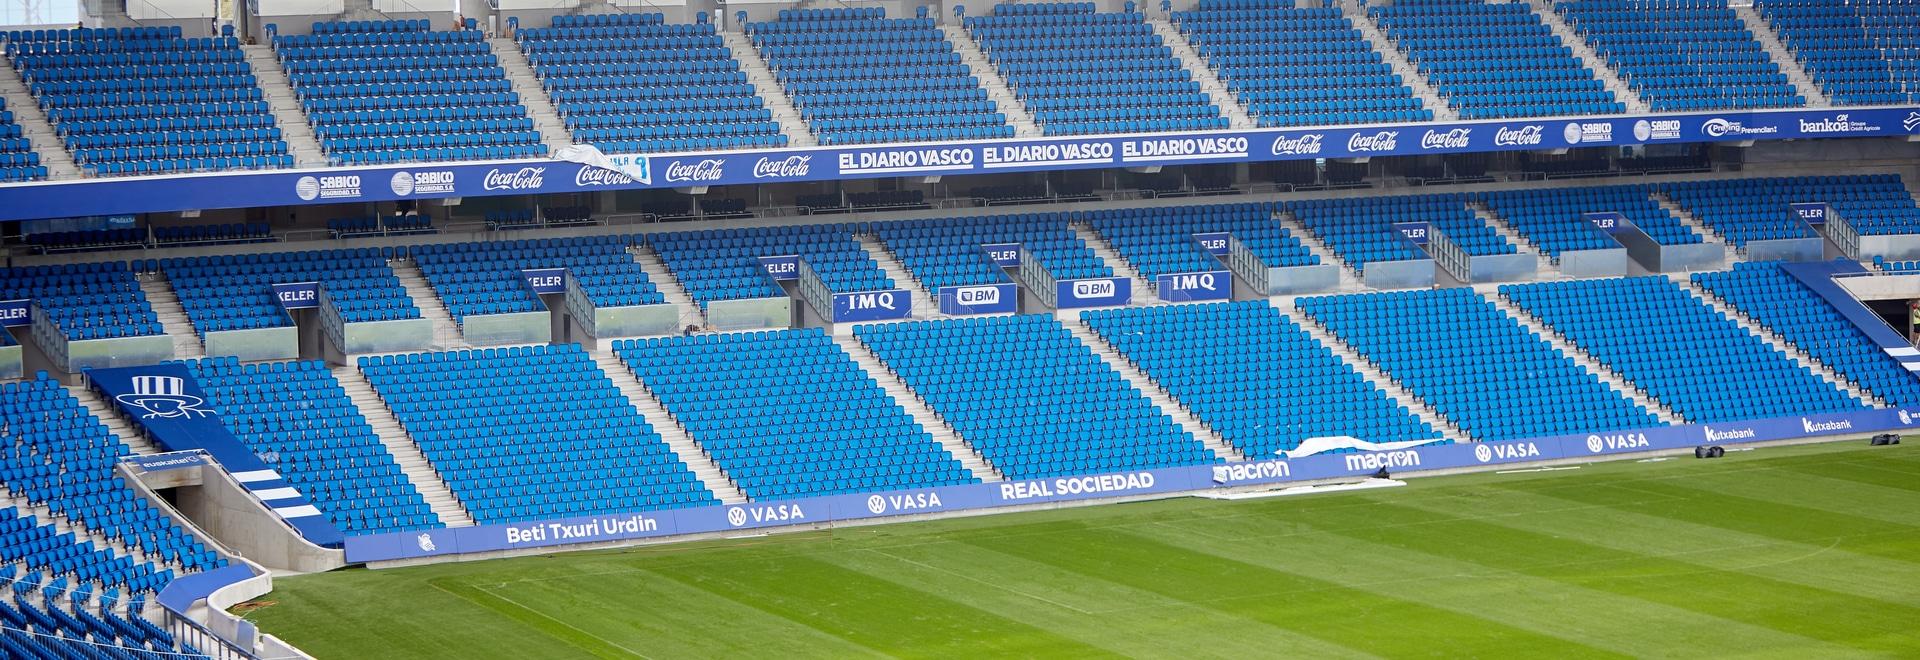 The reform of Anoeta Stadium – Real Sociedad C.F.